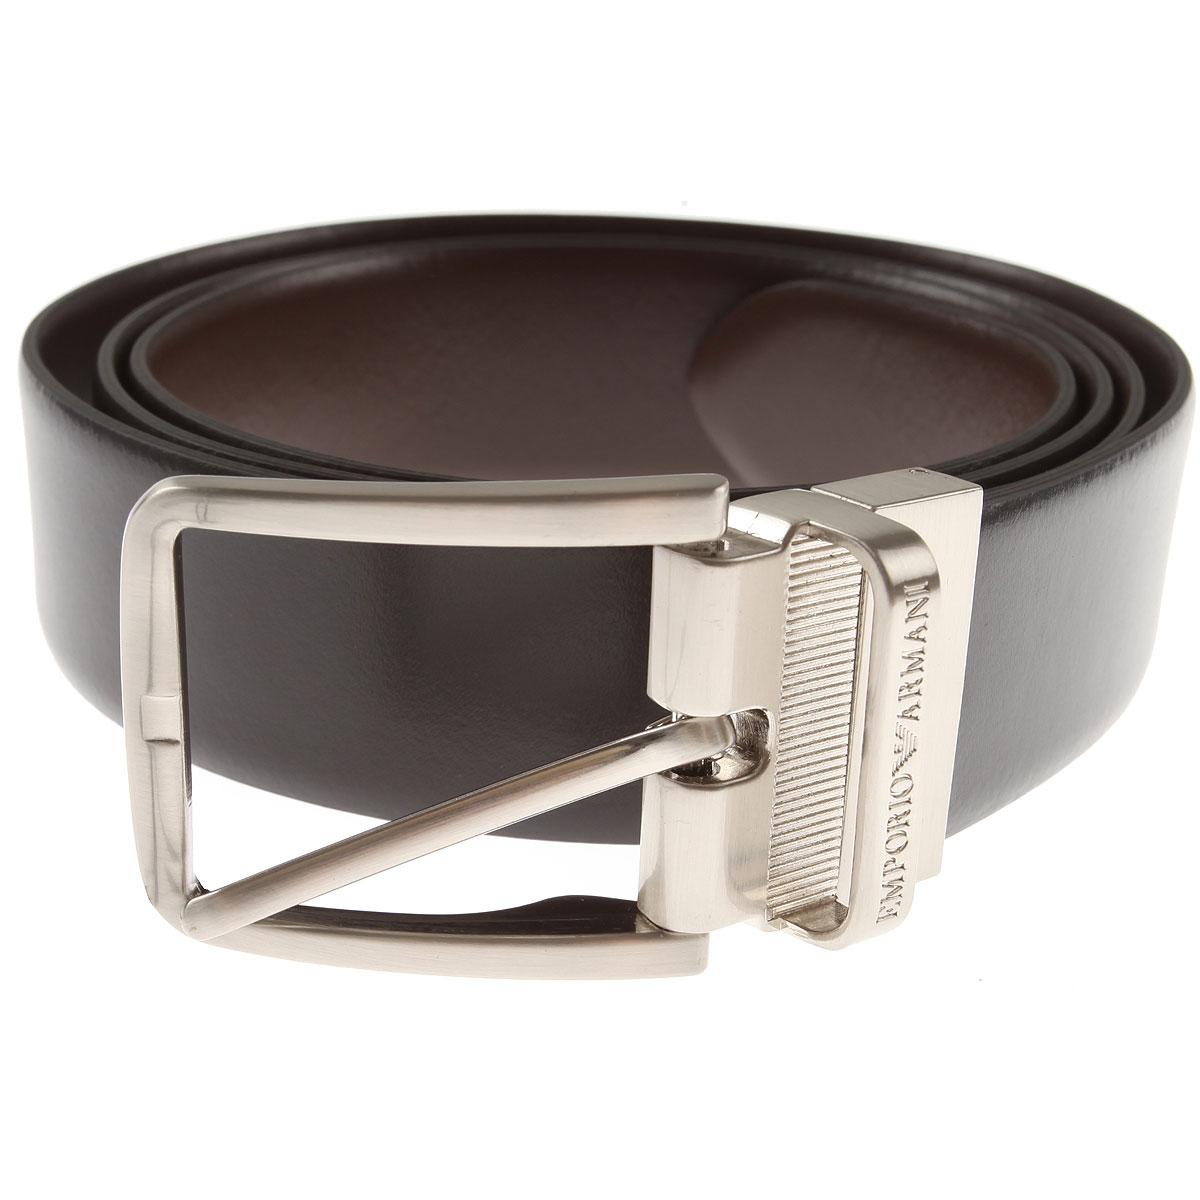 Emporio Armani Mens Belts, Black, Leather, 2017